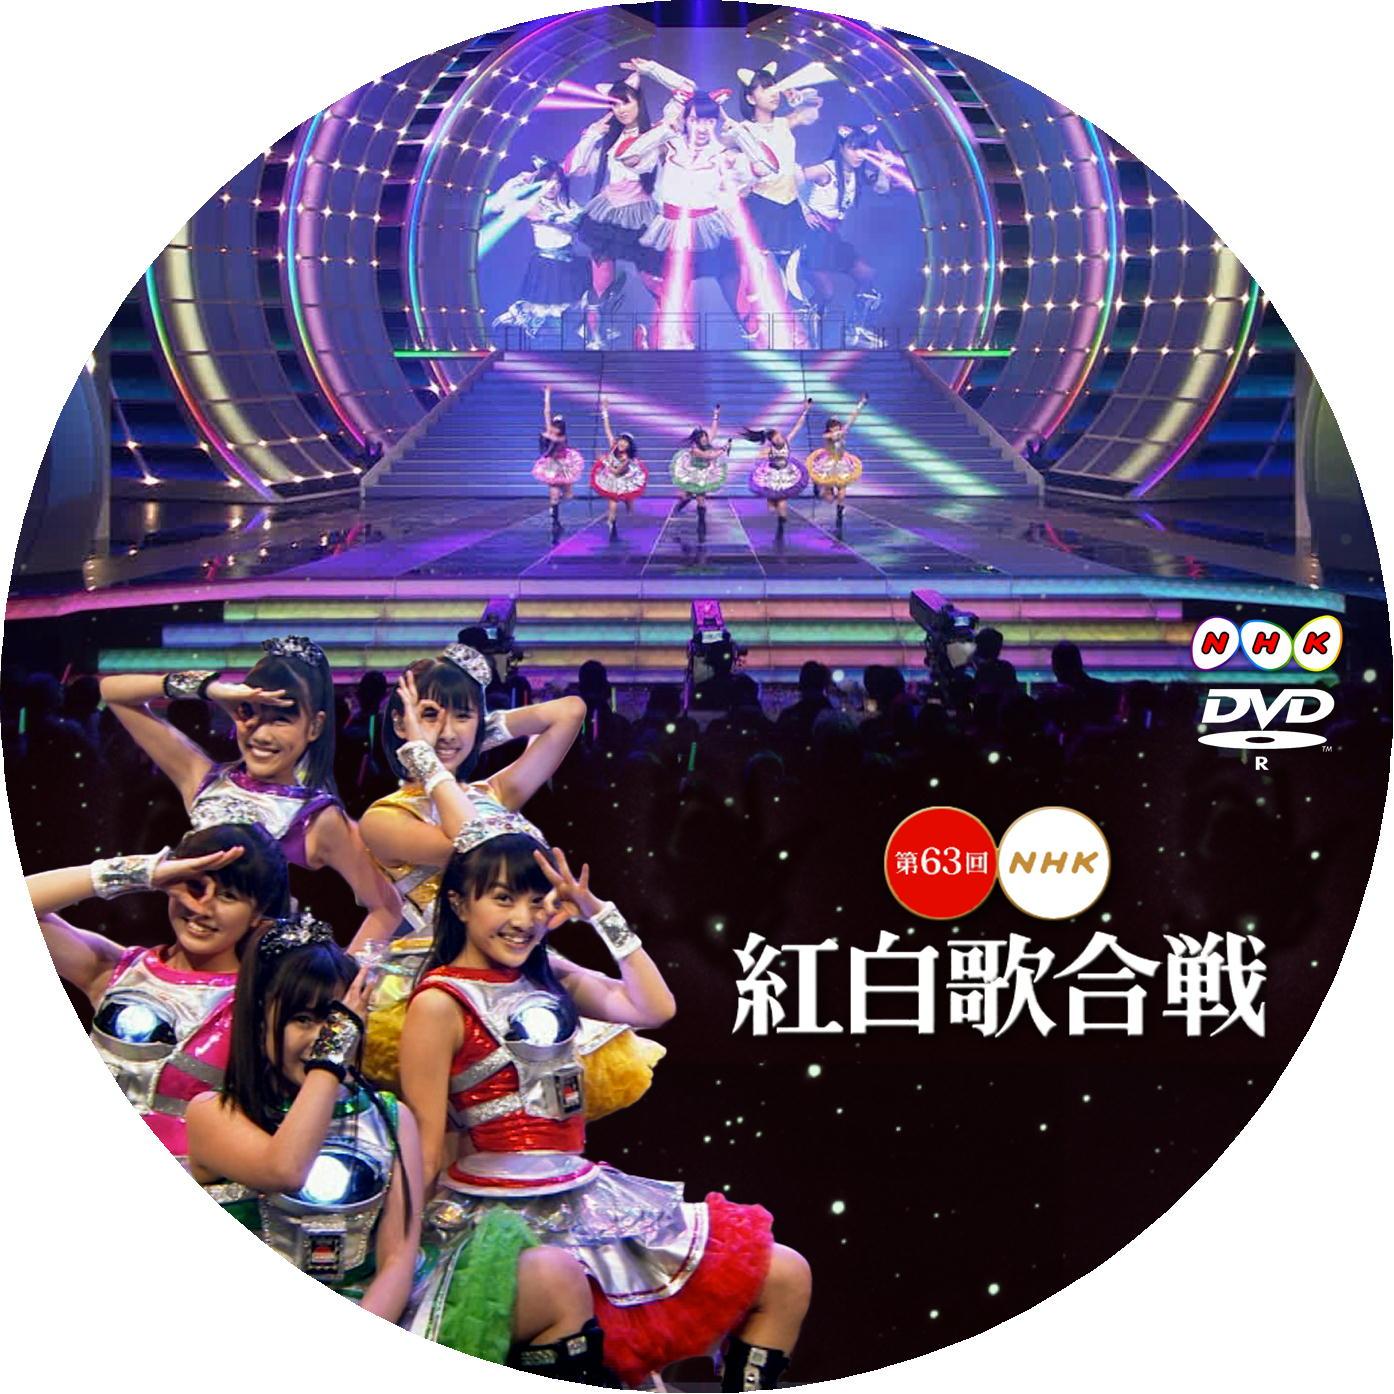 NHK紅白歌合戦 2012 ももクロ<br /> v2 DVDラベル